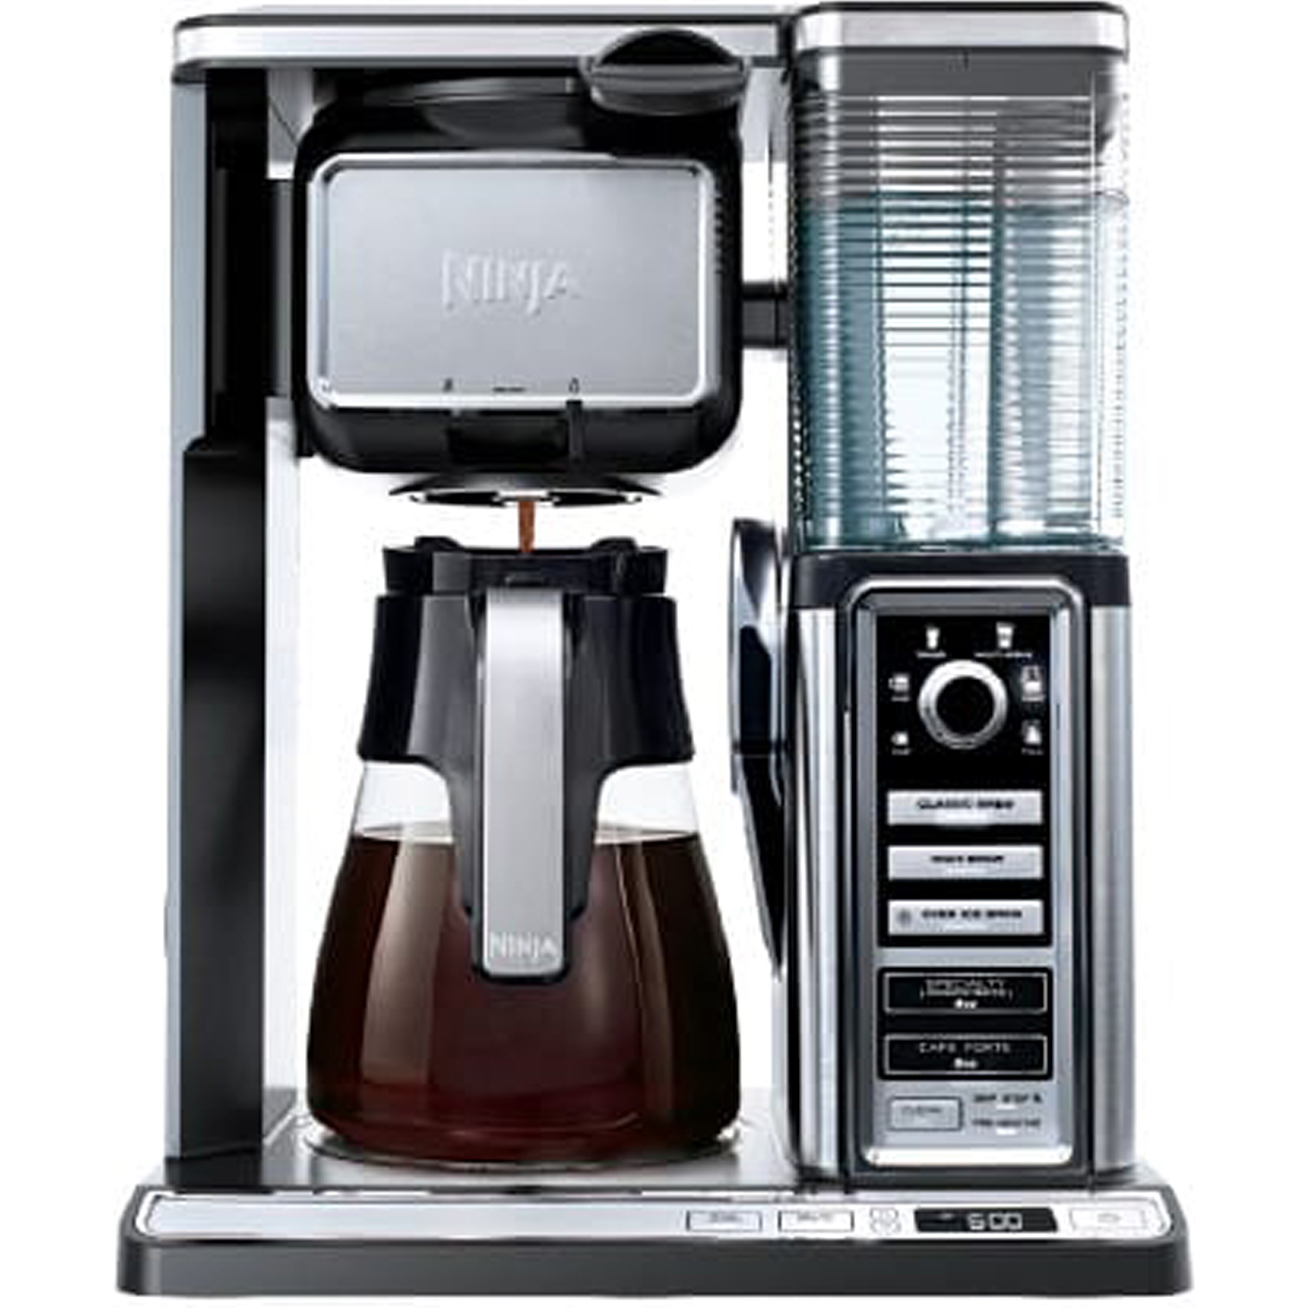 Refurbished Ninja Coffee BarGlass Carafe System-CF090CO